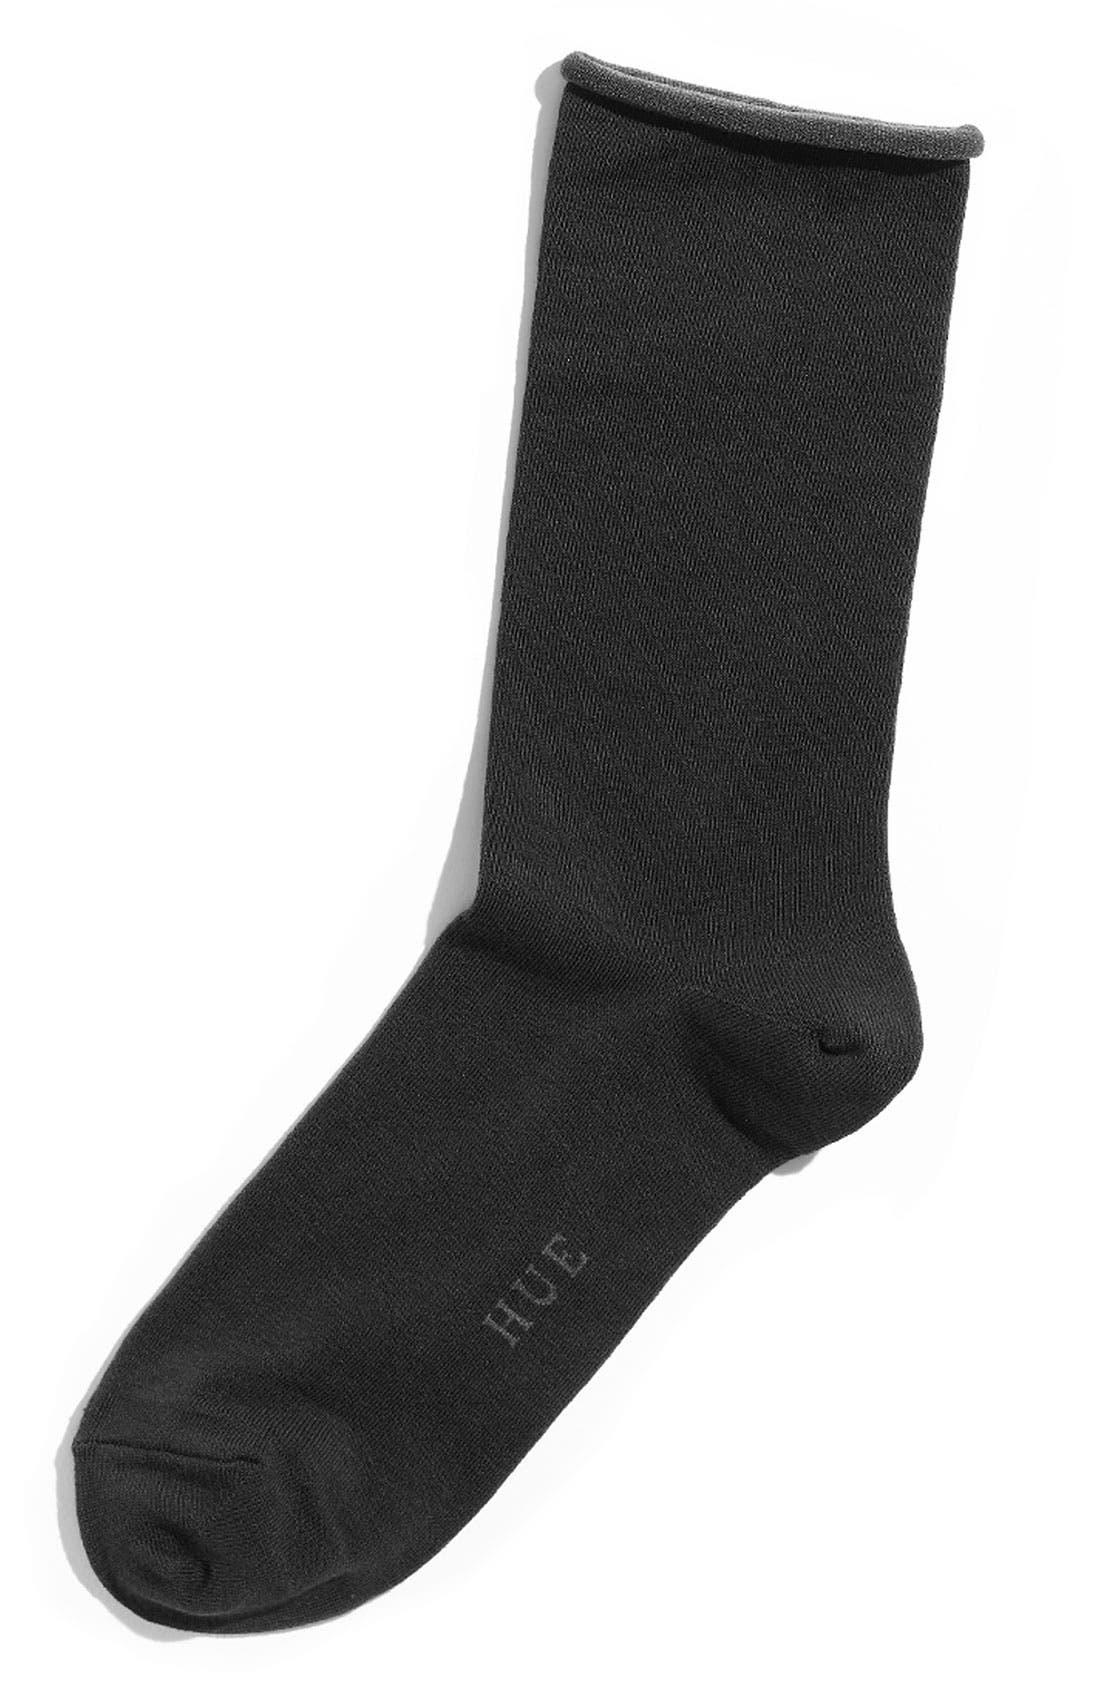 'Jeans' Socks,                         Main,                         color, 001